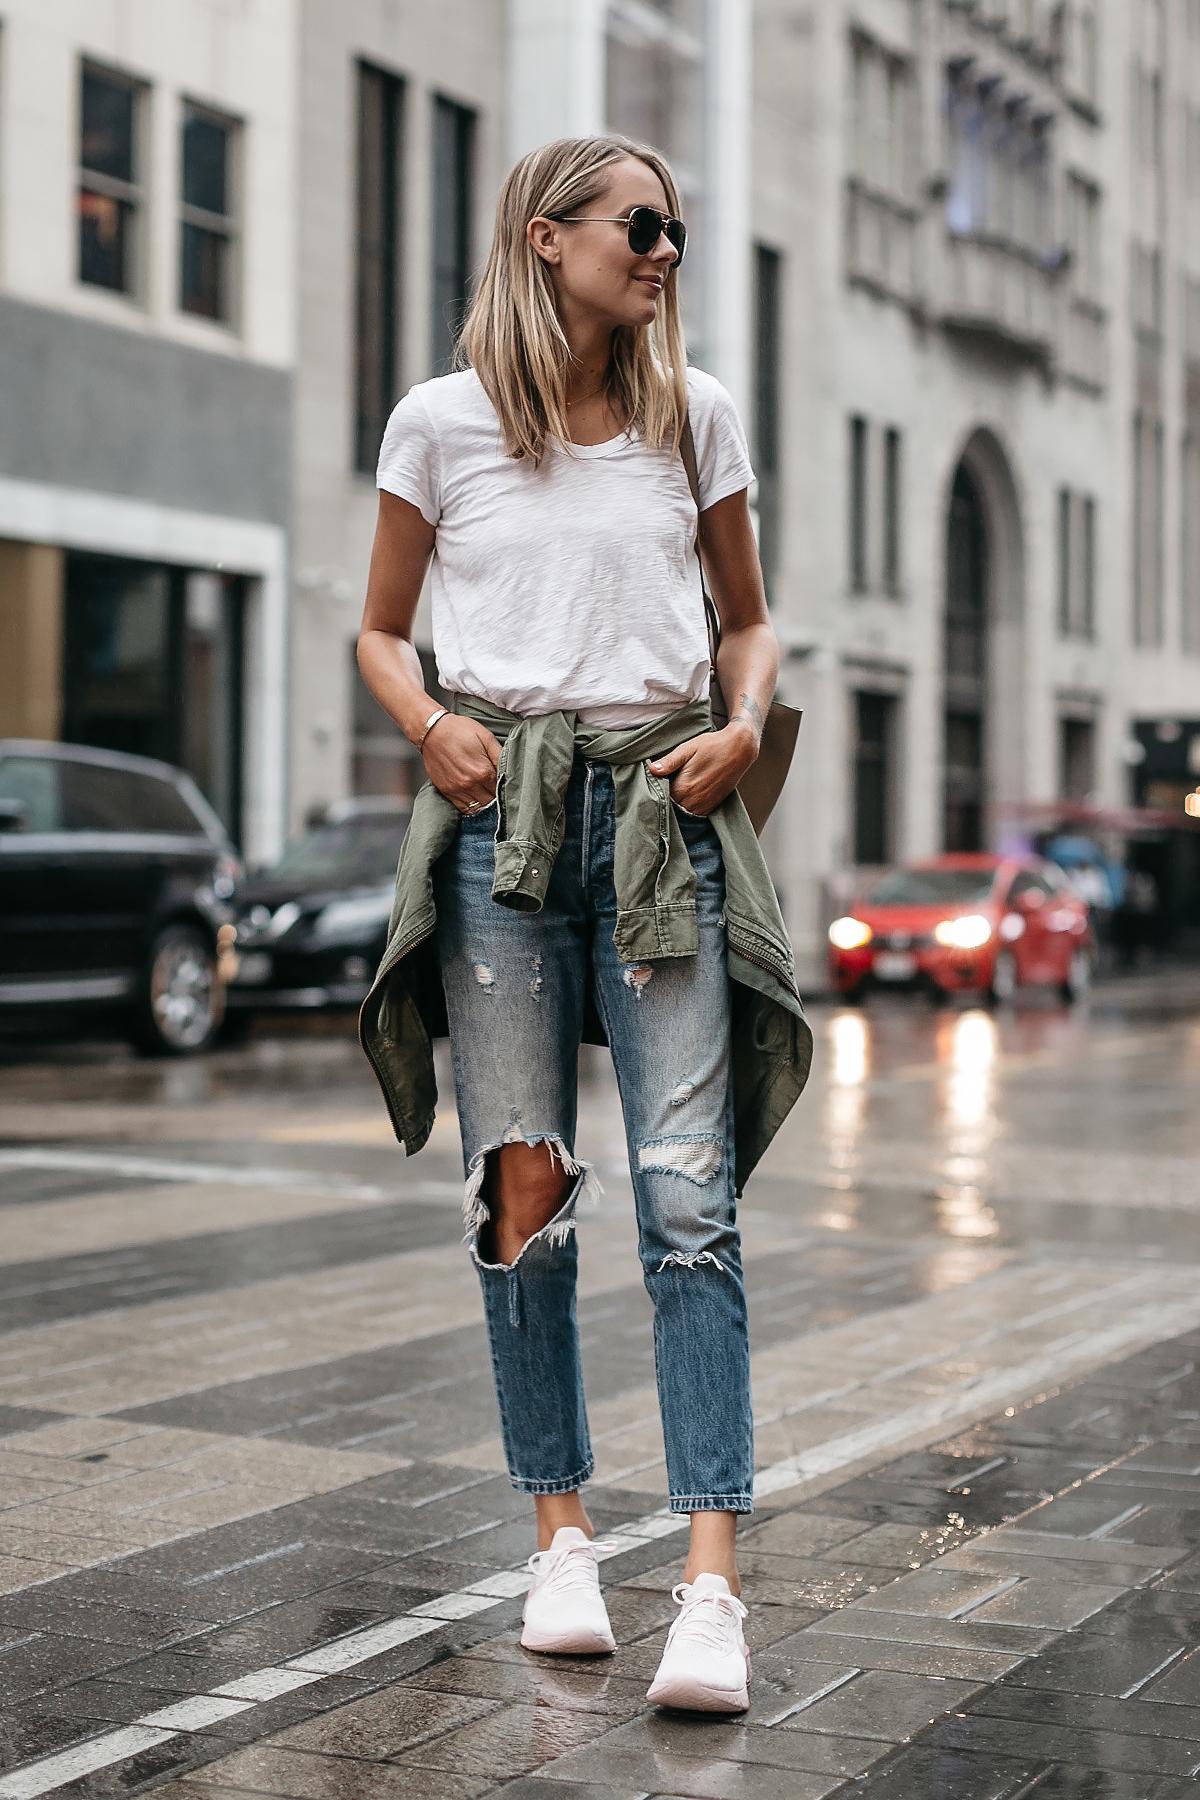 Blonde Woman Wearing Nike React Running Shoe White Tshirt Ripped Denim Jeans Green Utility Jacket Fashion Jackson Dallas Blogger Fashion Blogger Street Style